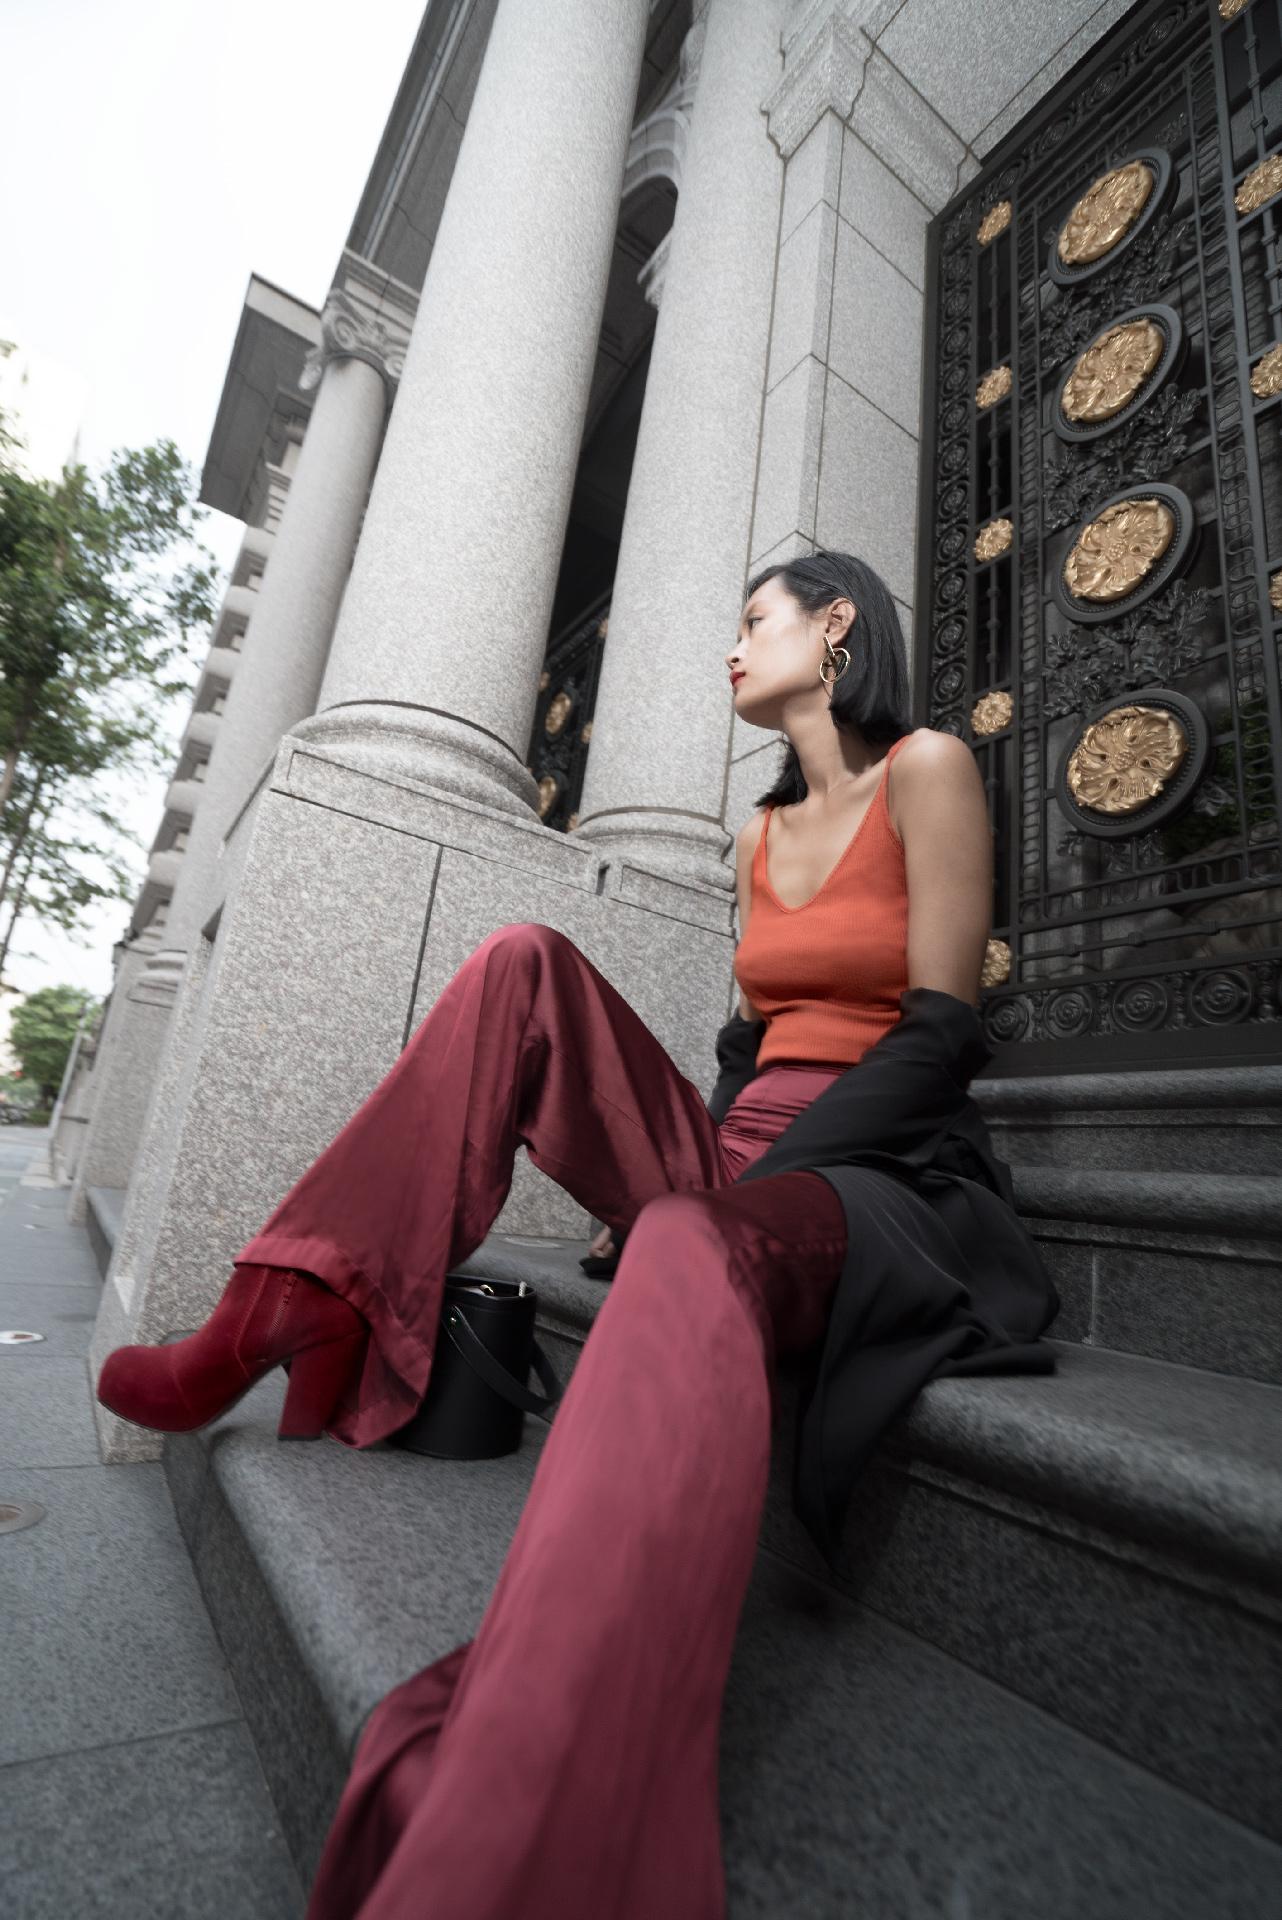 Wearing Silk Pants in Fall, silk pants, red silk pants